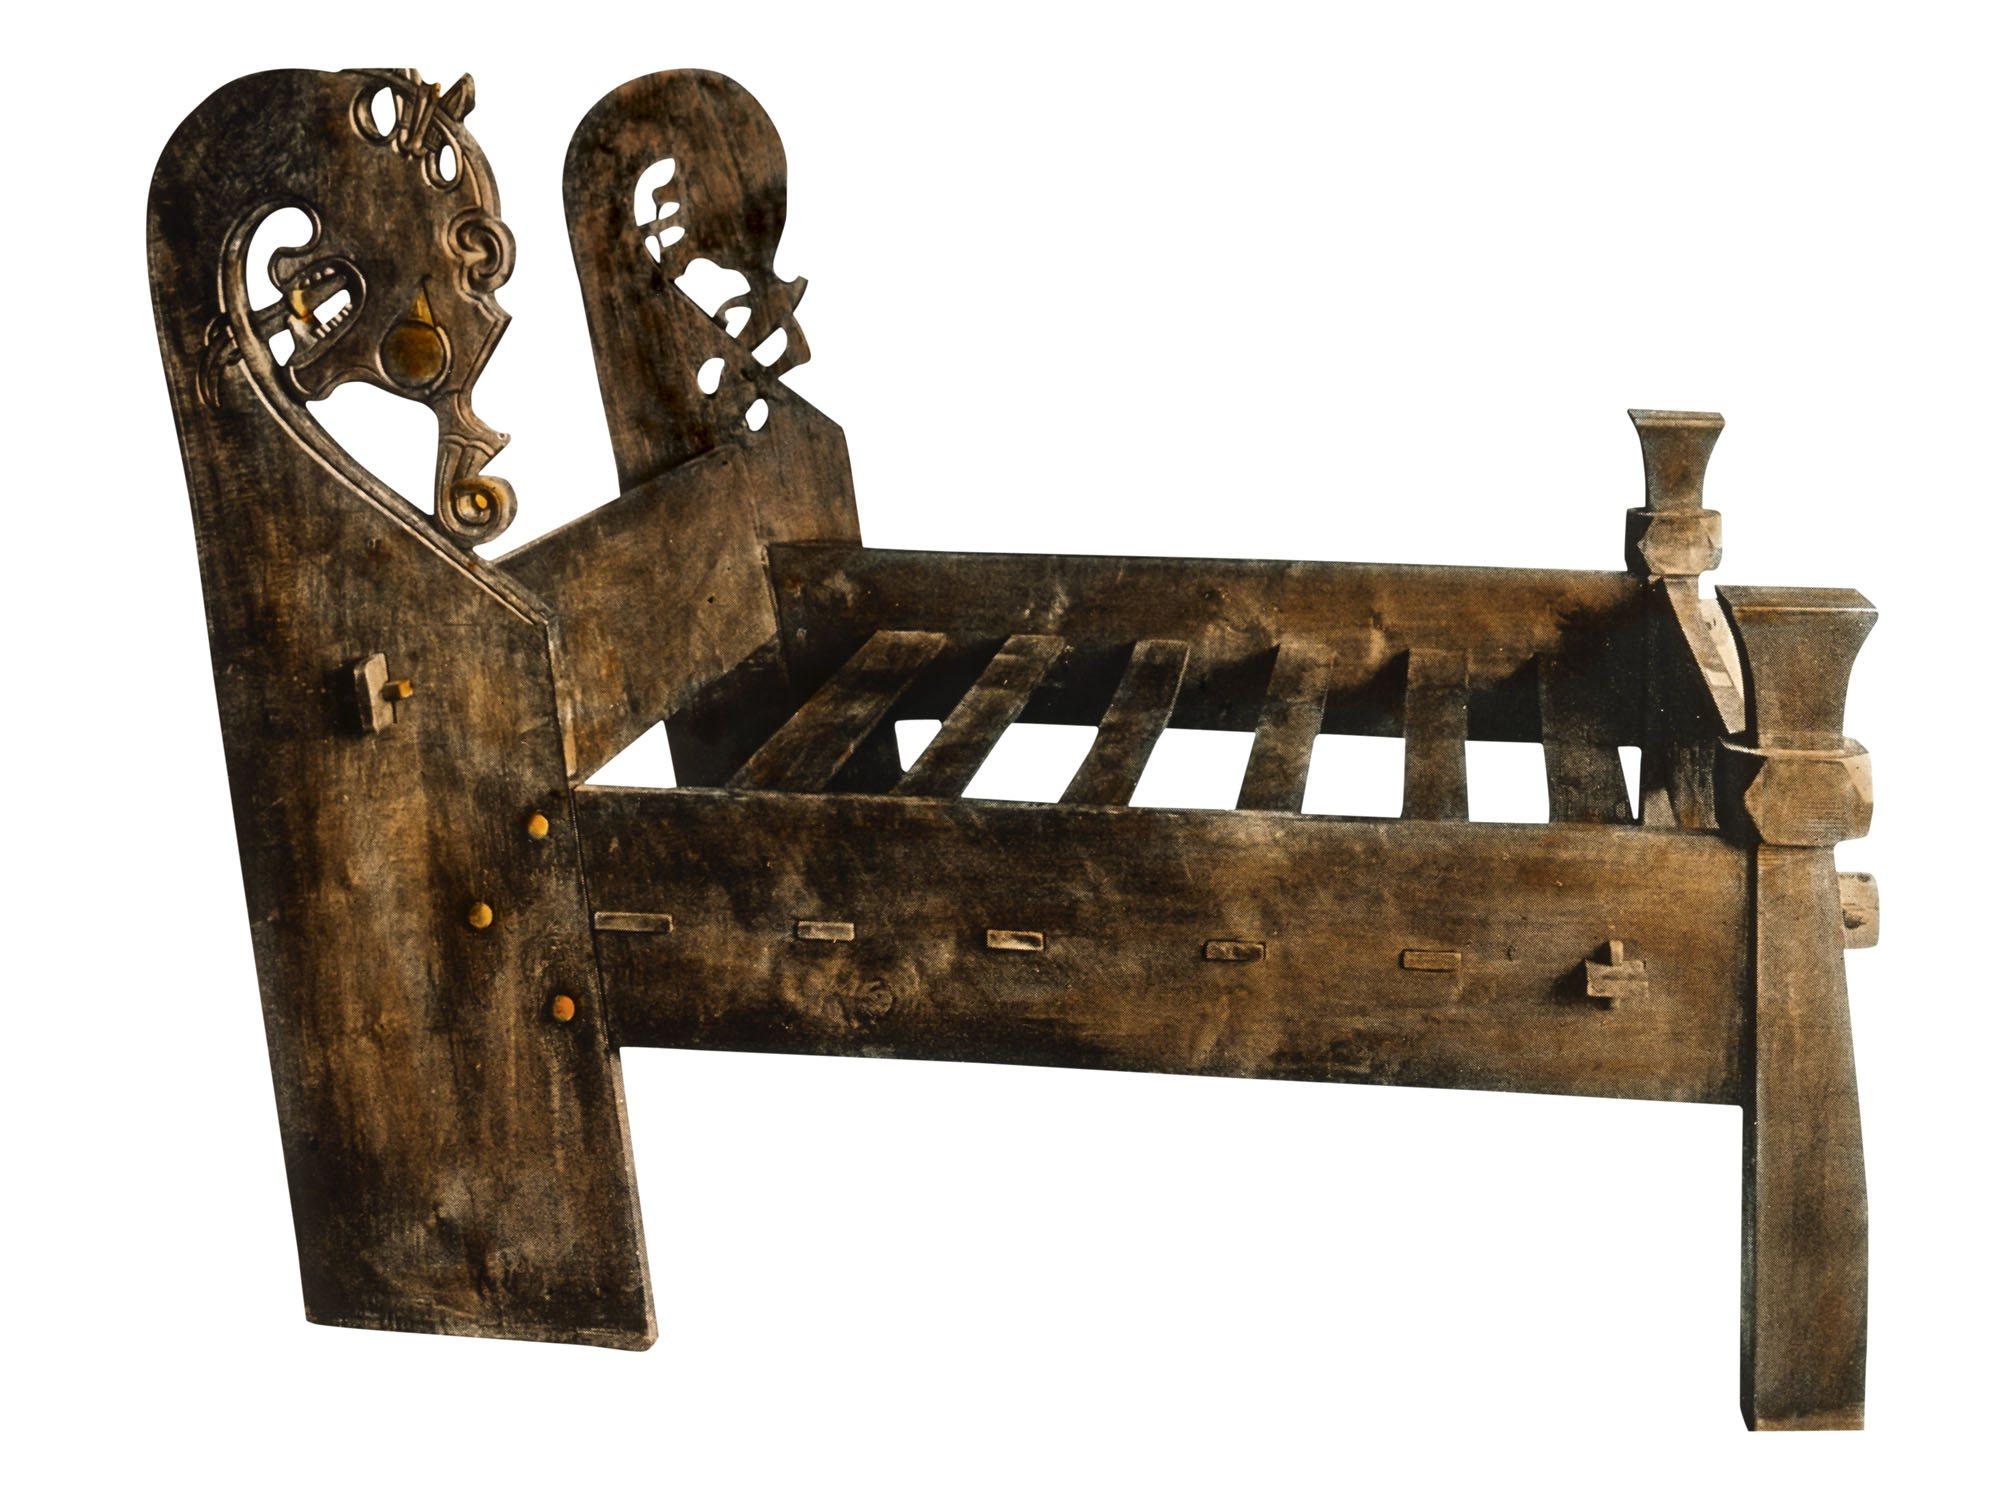 El barco de oseberg la tumba secreta de una reina vikinga for Viking muebles